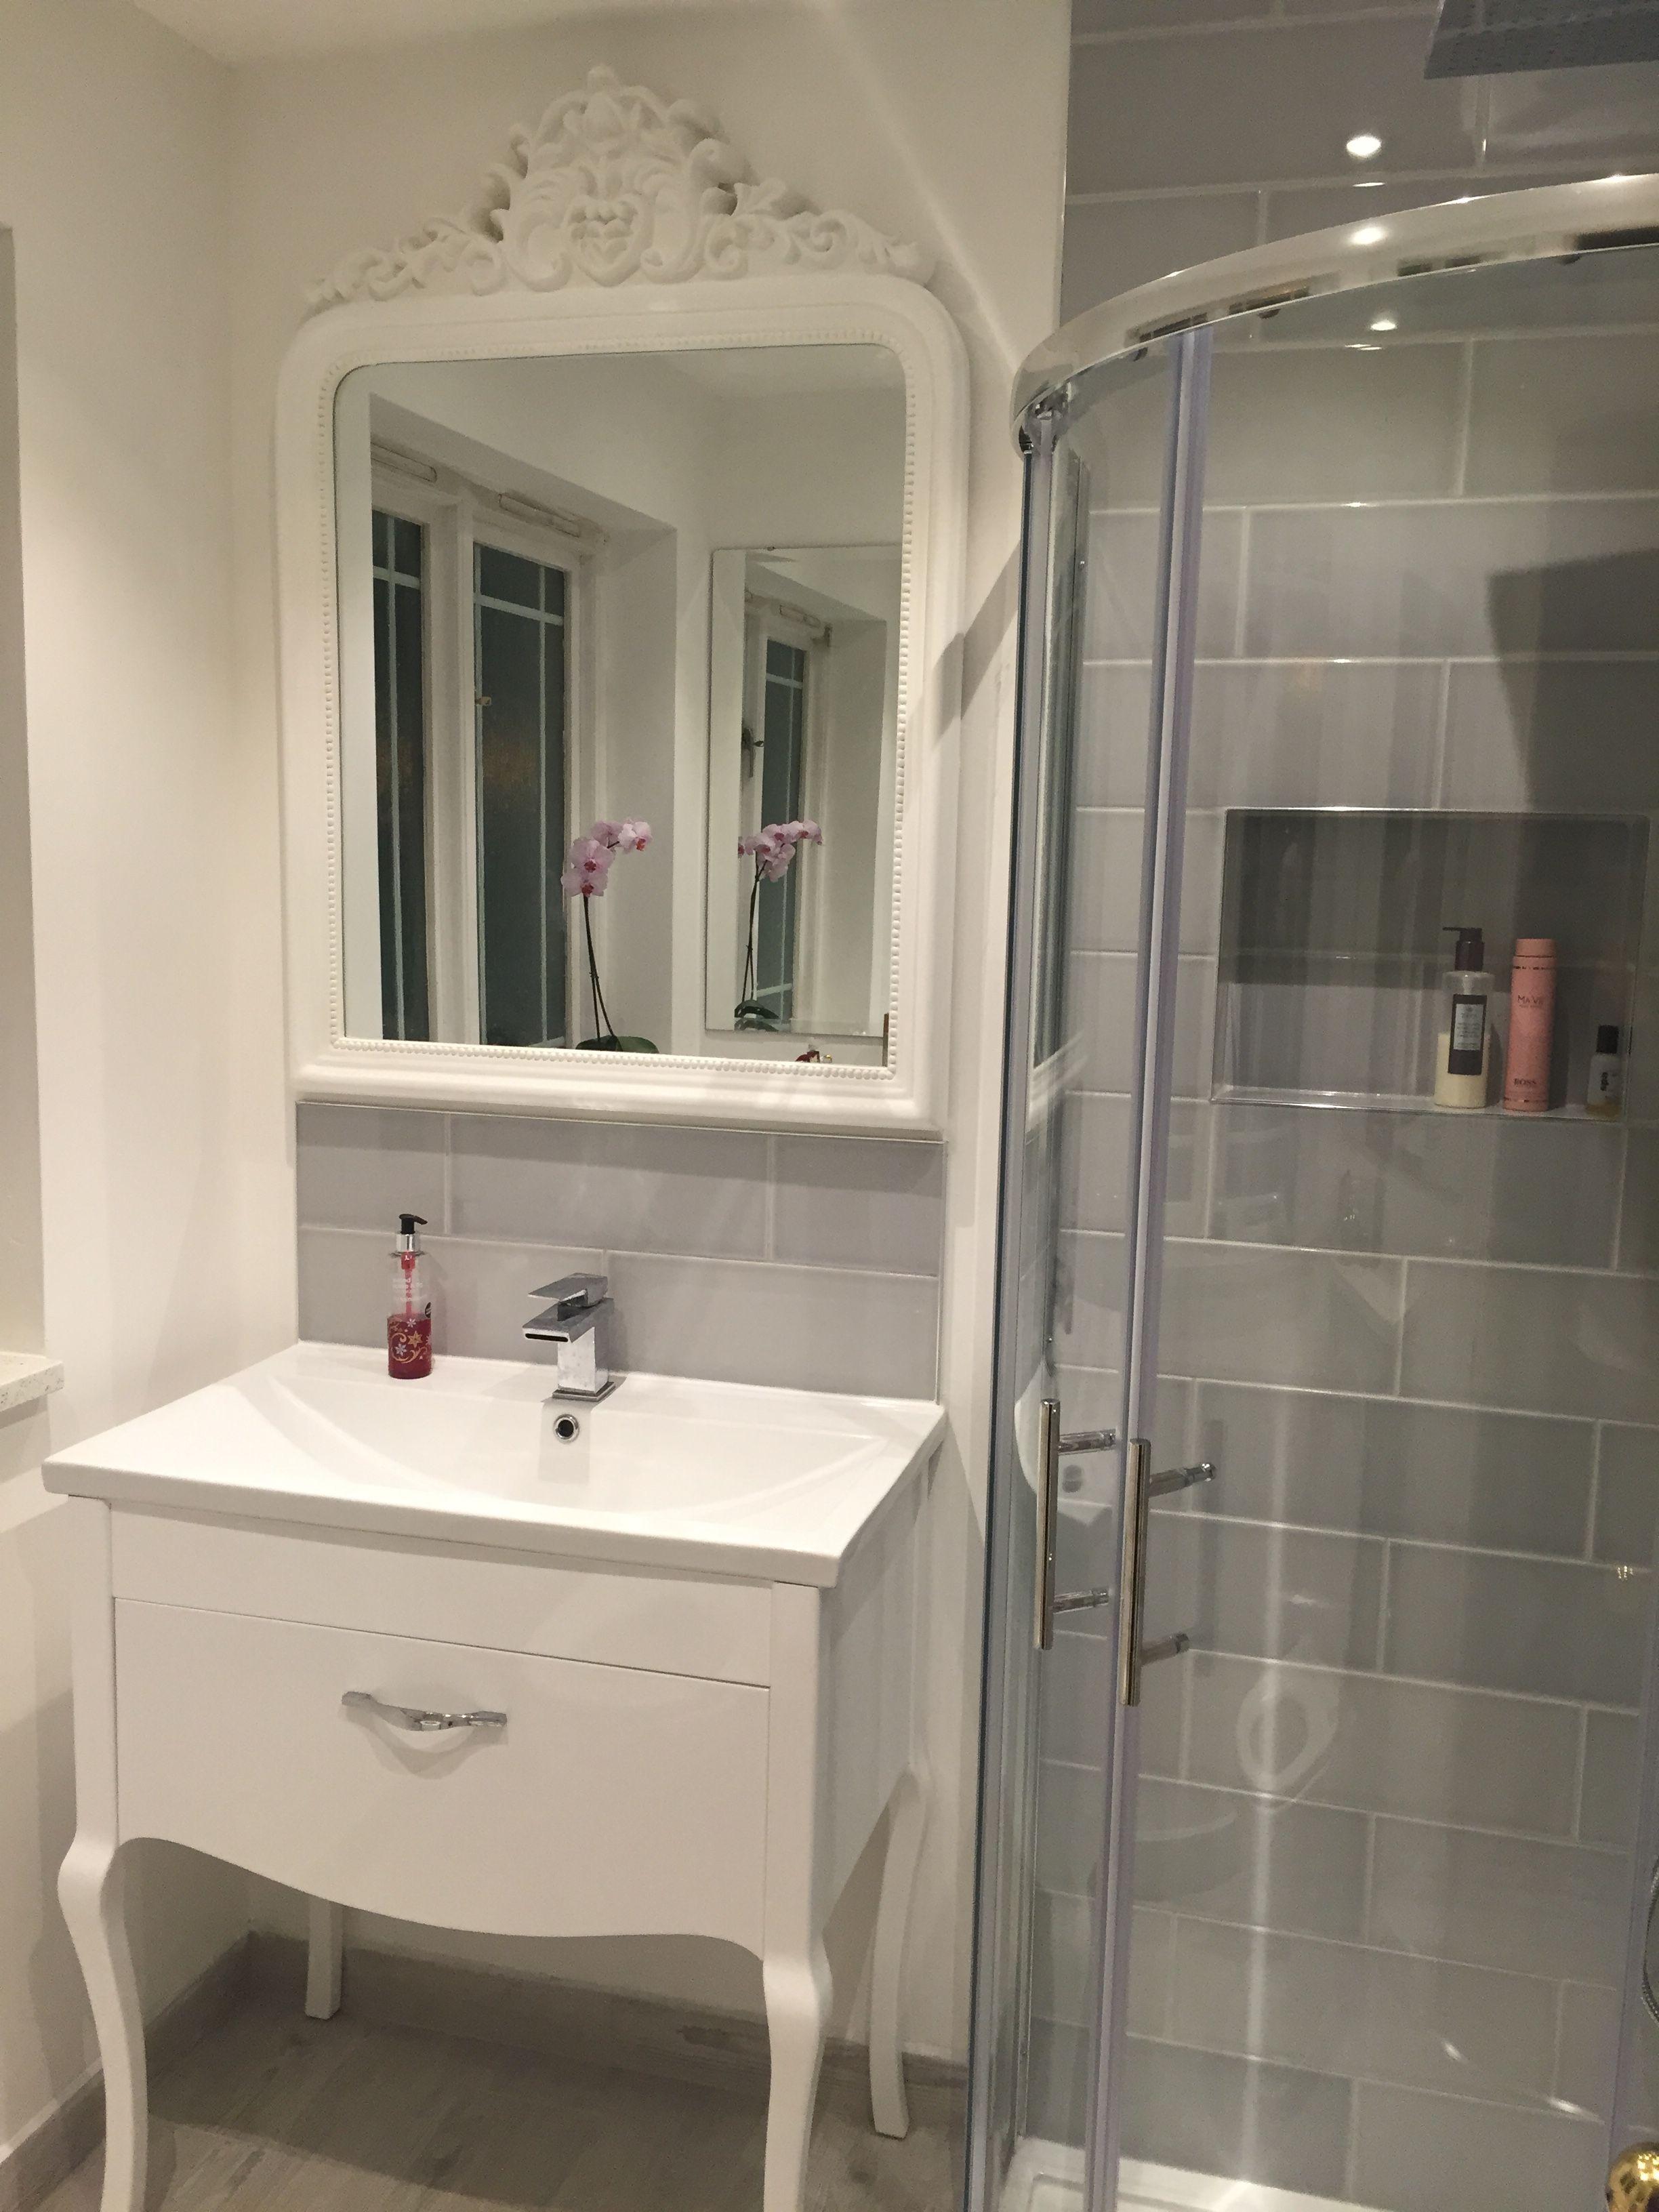 Attingham Mist Topps Tiles Bathroom Wall Tile Bathroom Loft Bathroom